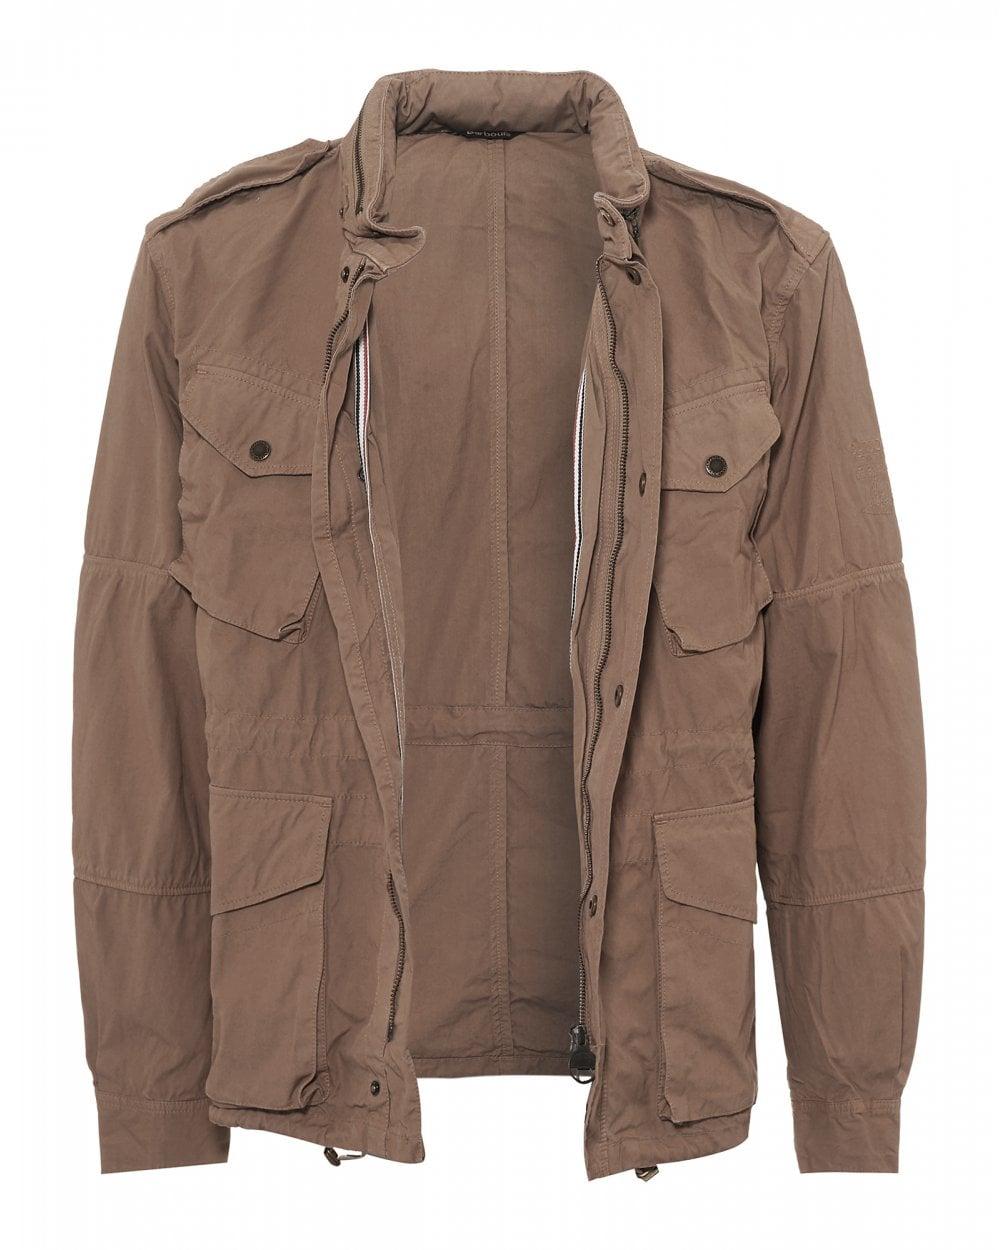 Casual Jacket Mens International Barbour Dual Mcqueen Steve qWPBSqOcx1